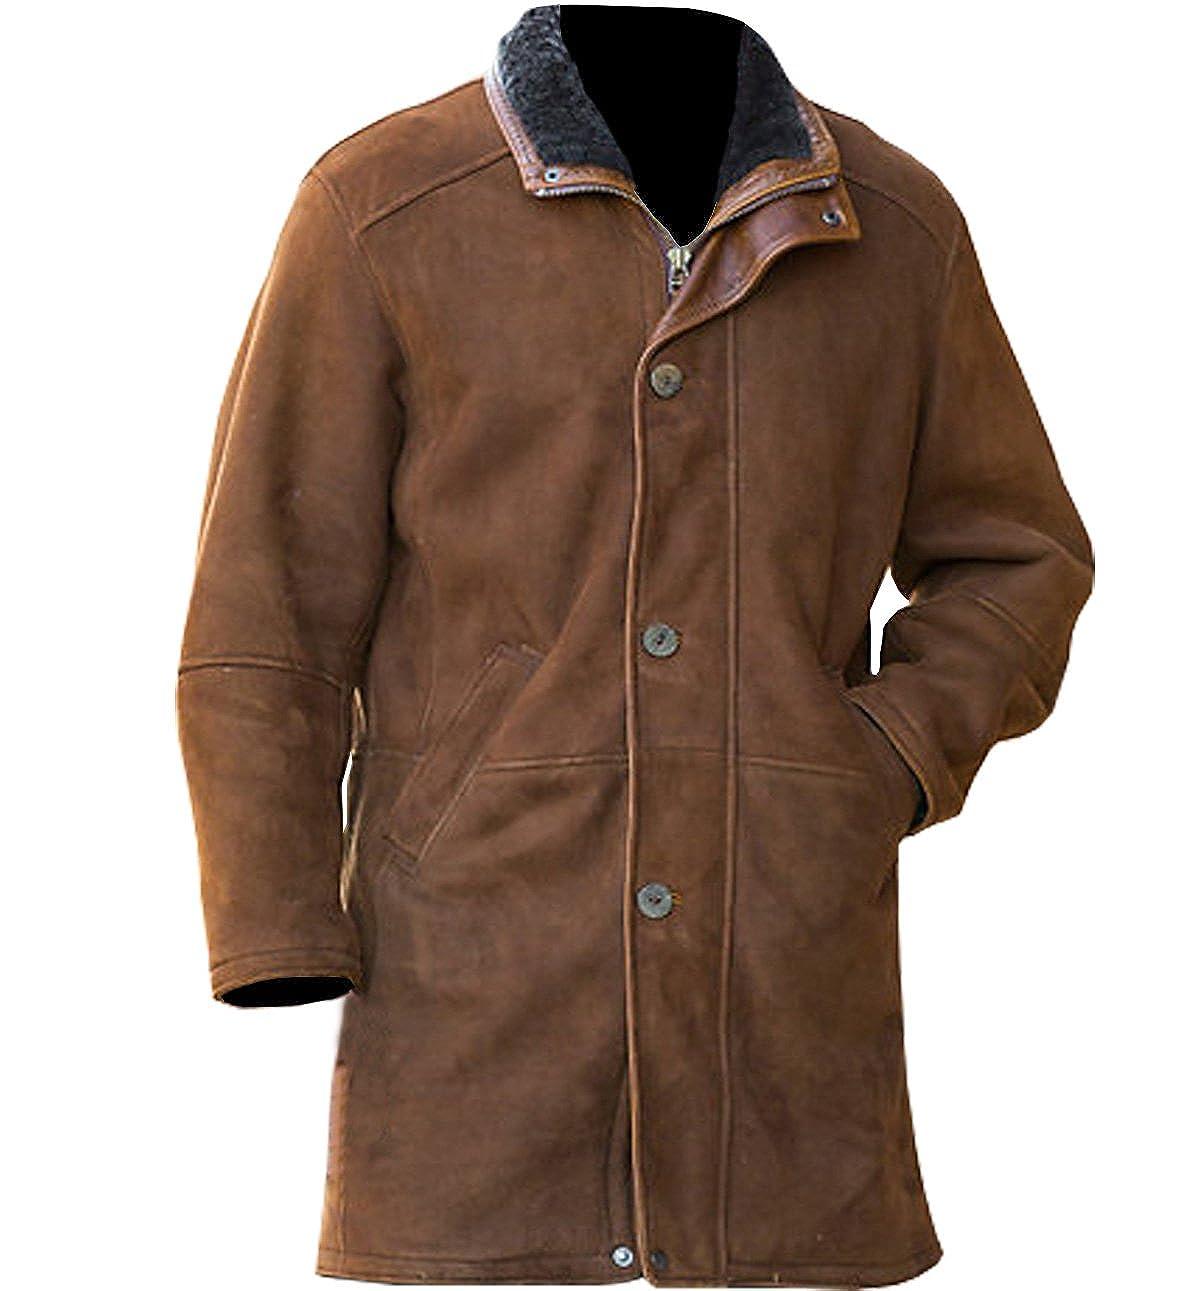 6227d7db0 NMFashions Sheriff Walt Longmire Robert Taylor Trench Coat at Amazon ...